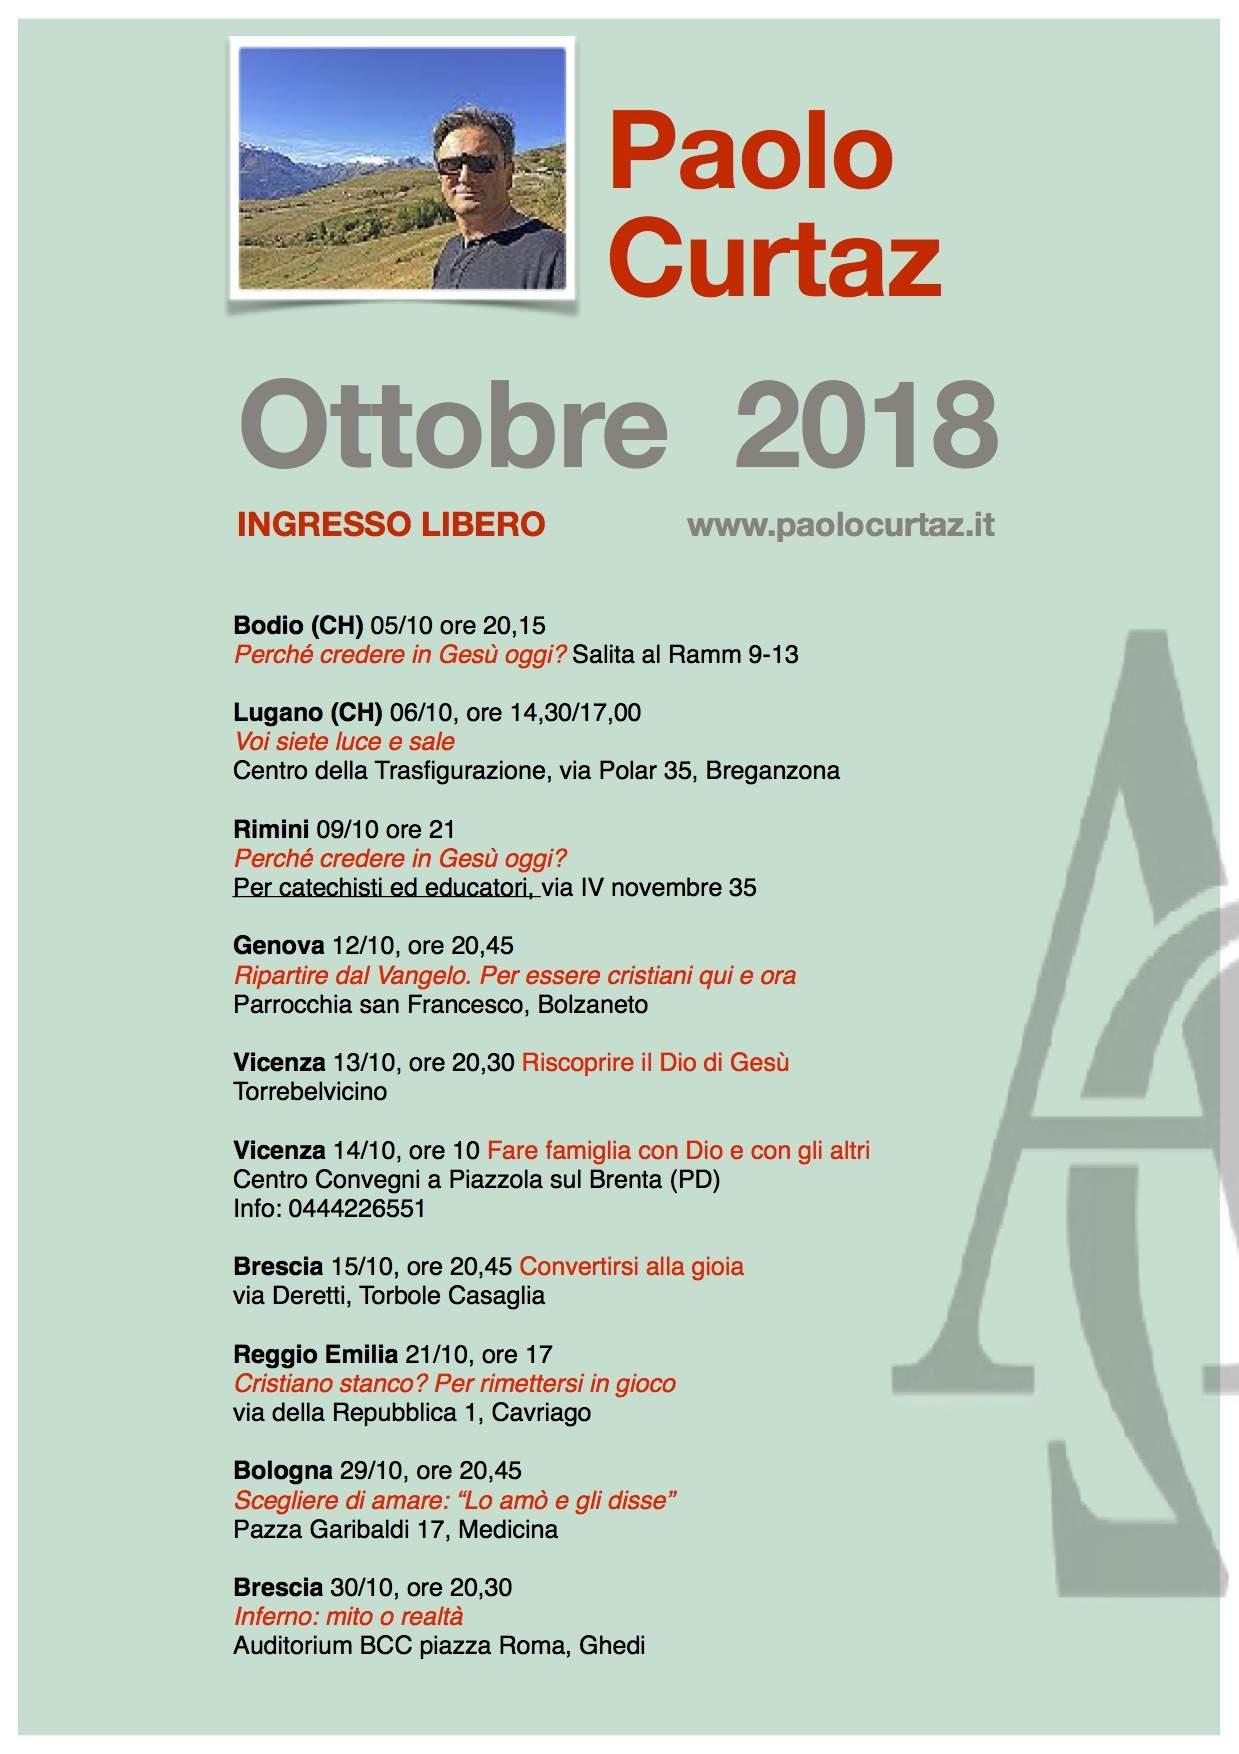 conferenze ottobre 2018 - paolo curtaz